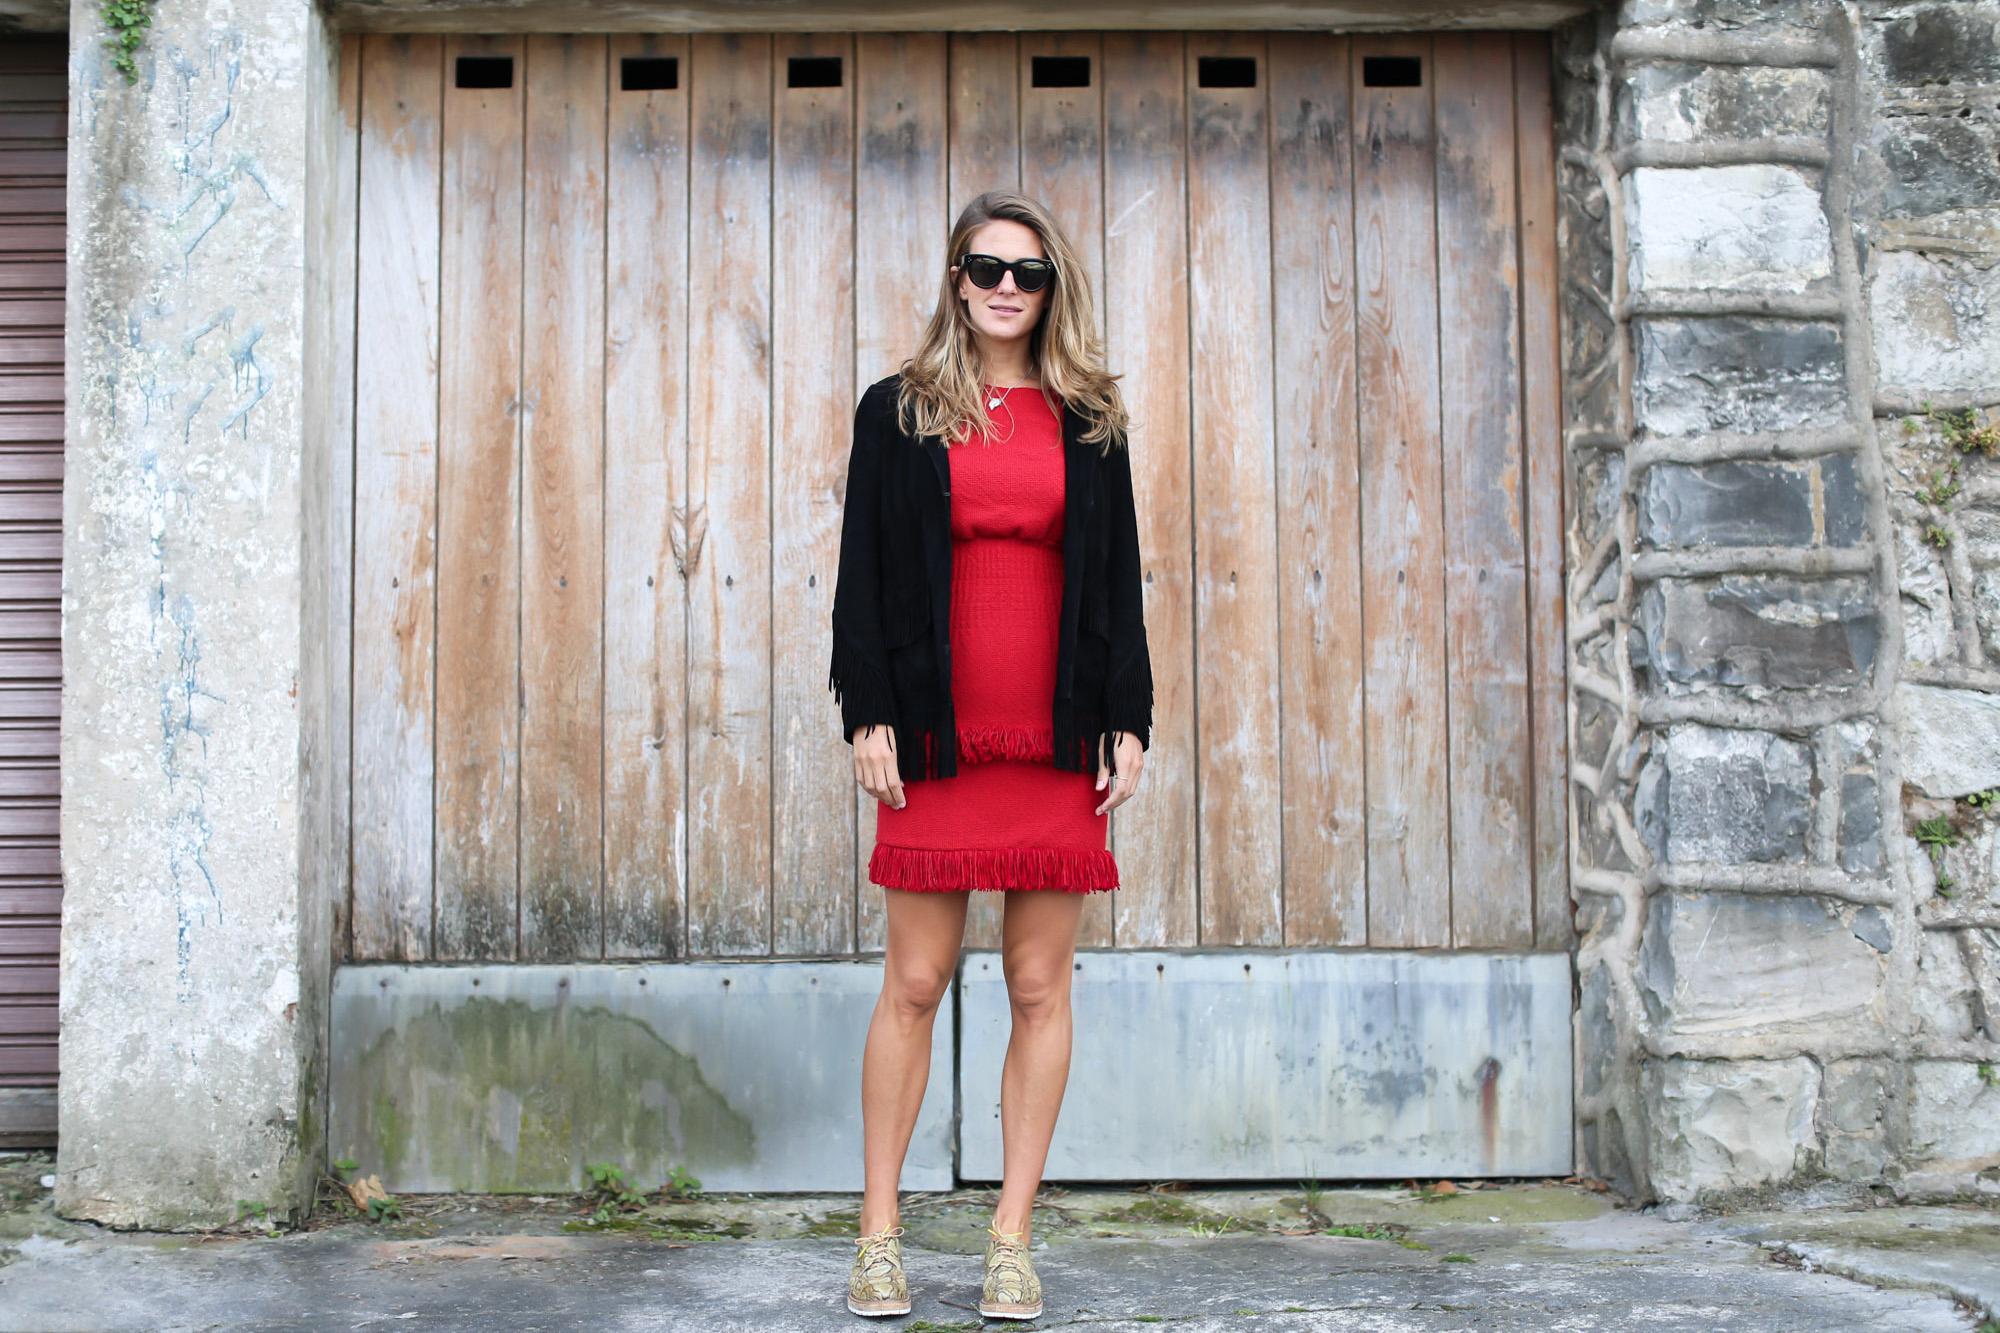 clochet_streetstyle_fashioblogger_maje_paris_reddress_majesuedefringedjacket_pertini_brogues_celine_sunglasses